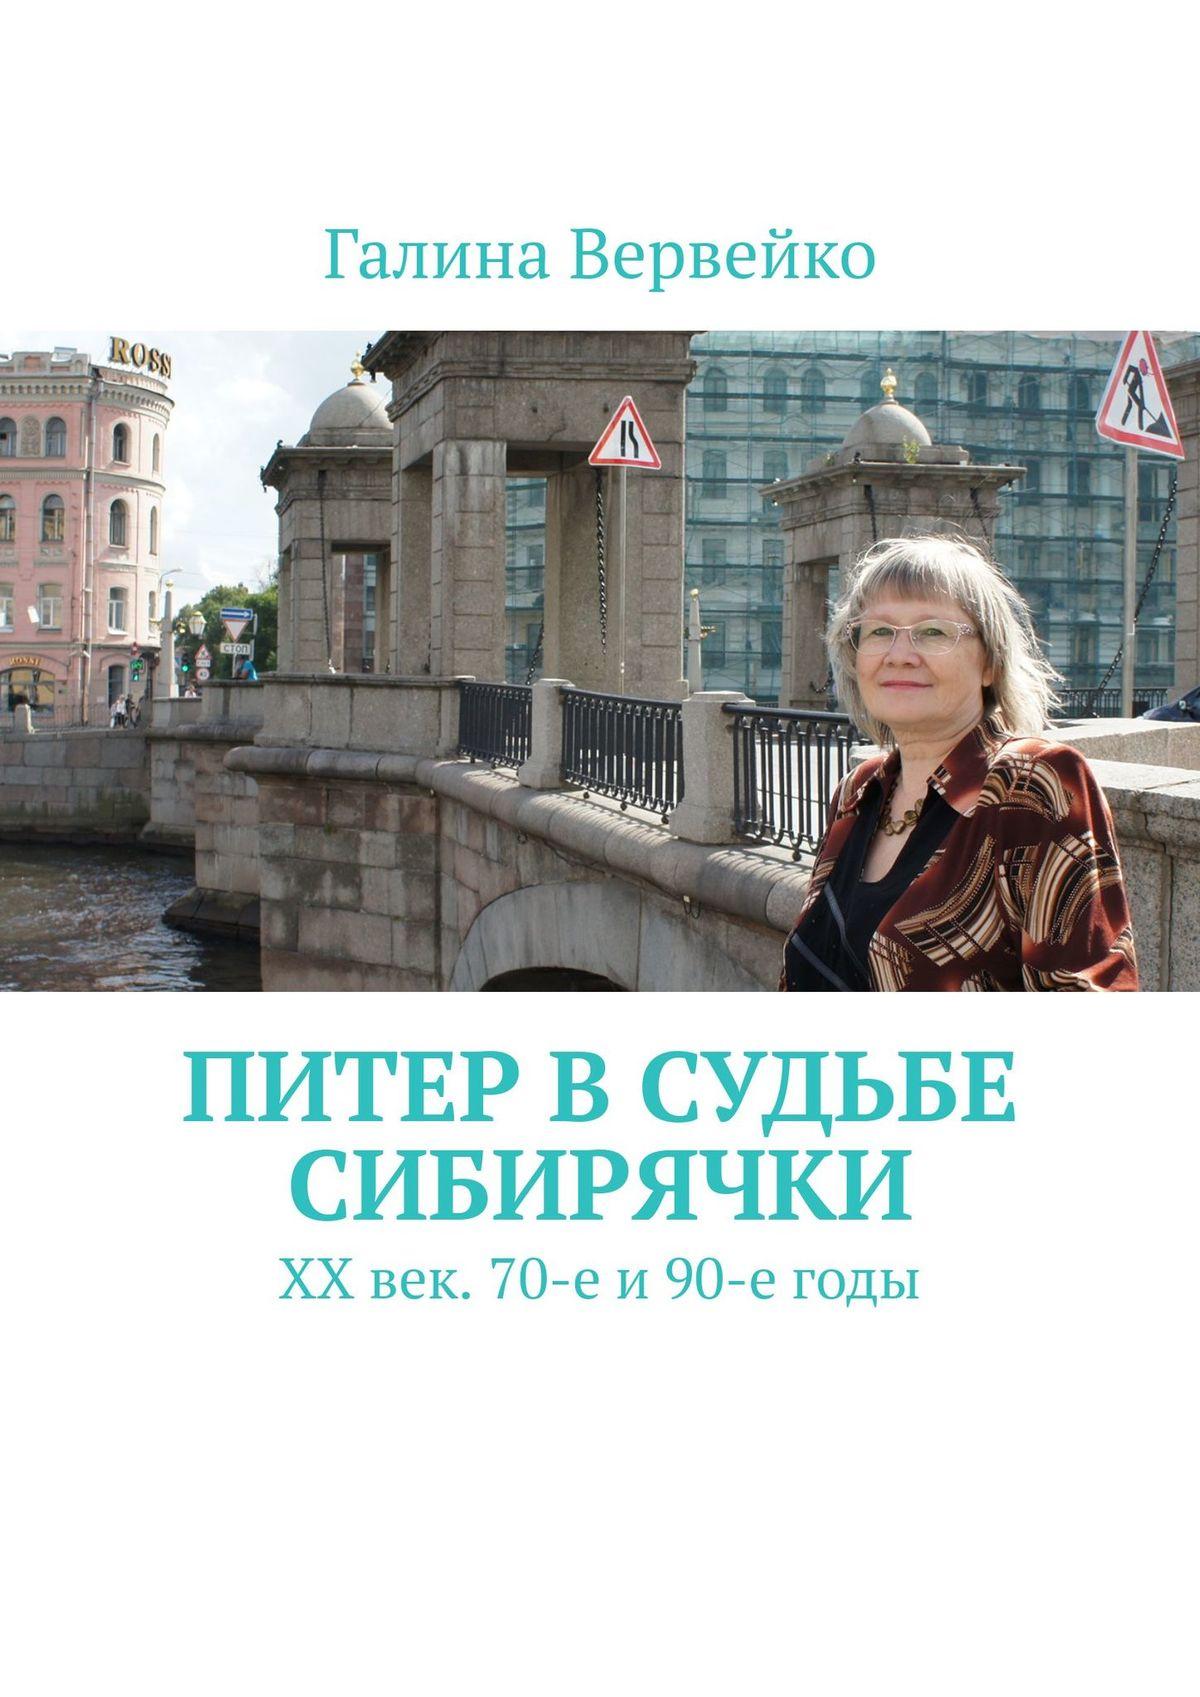 Галина Вервейко Питер в судьбе сибирячки. ХХвек. 70-е и90-егоды цена 2017